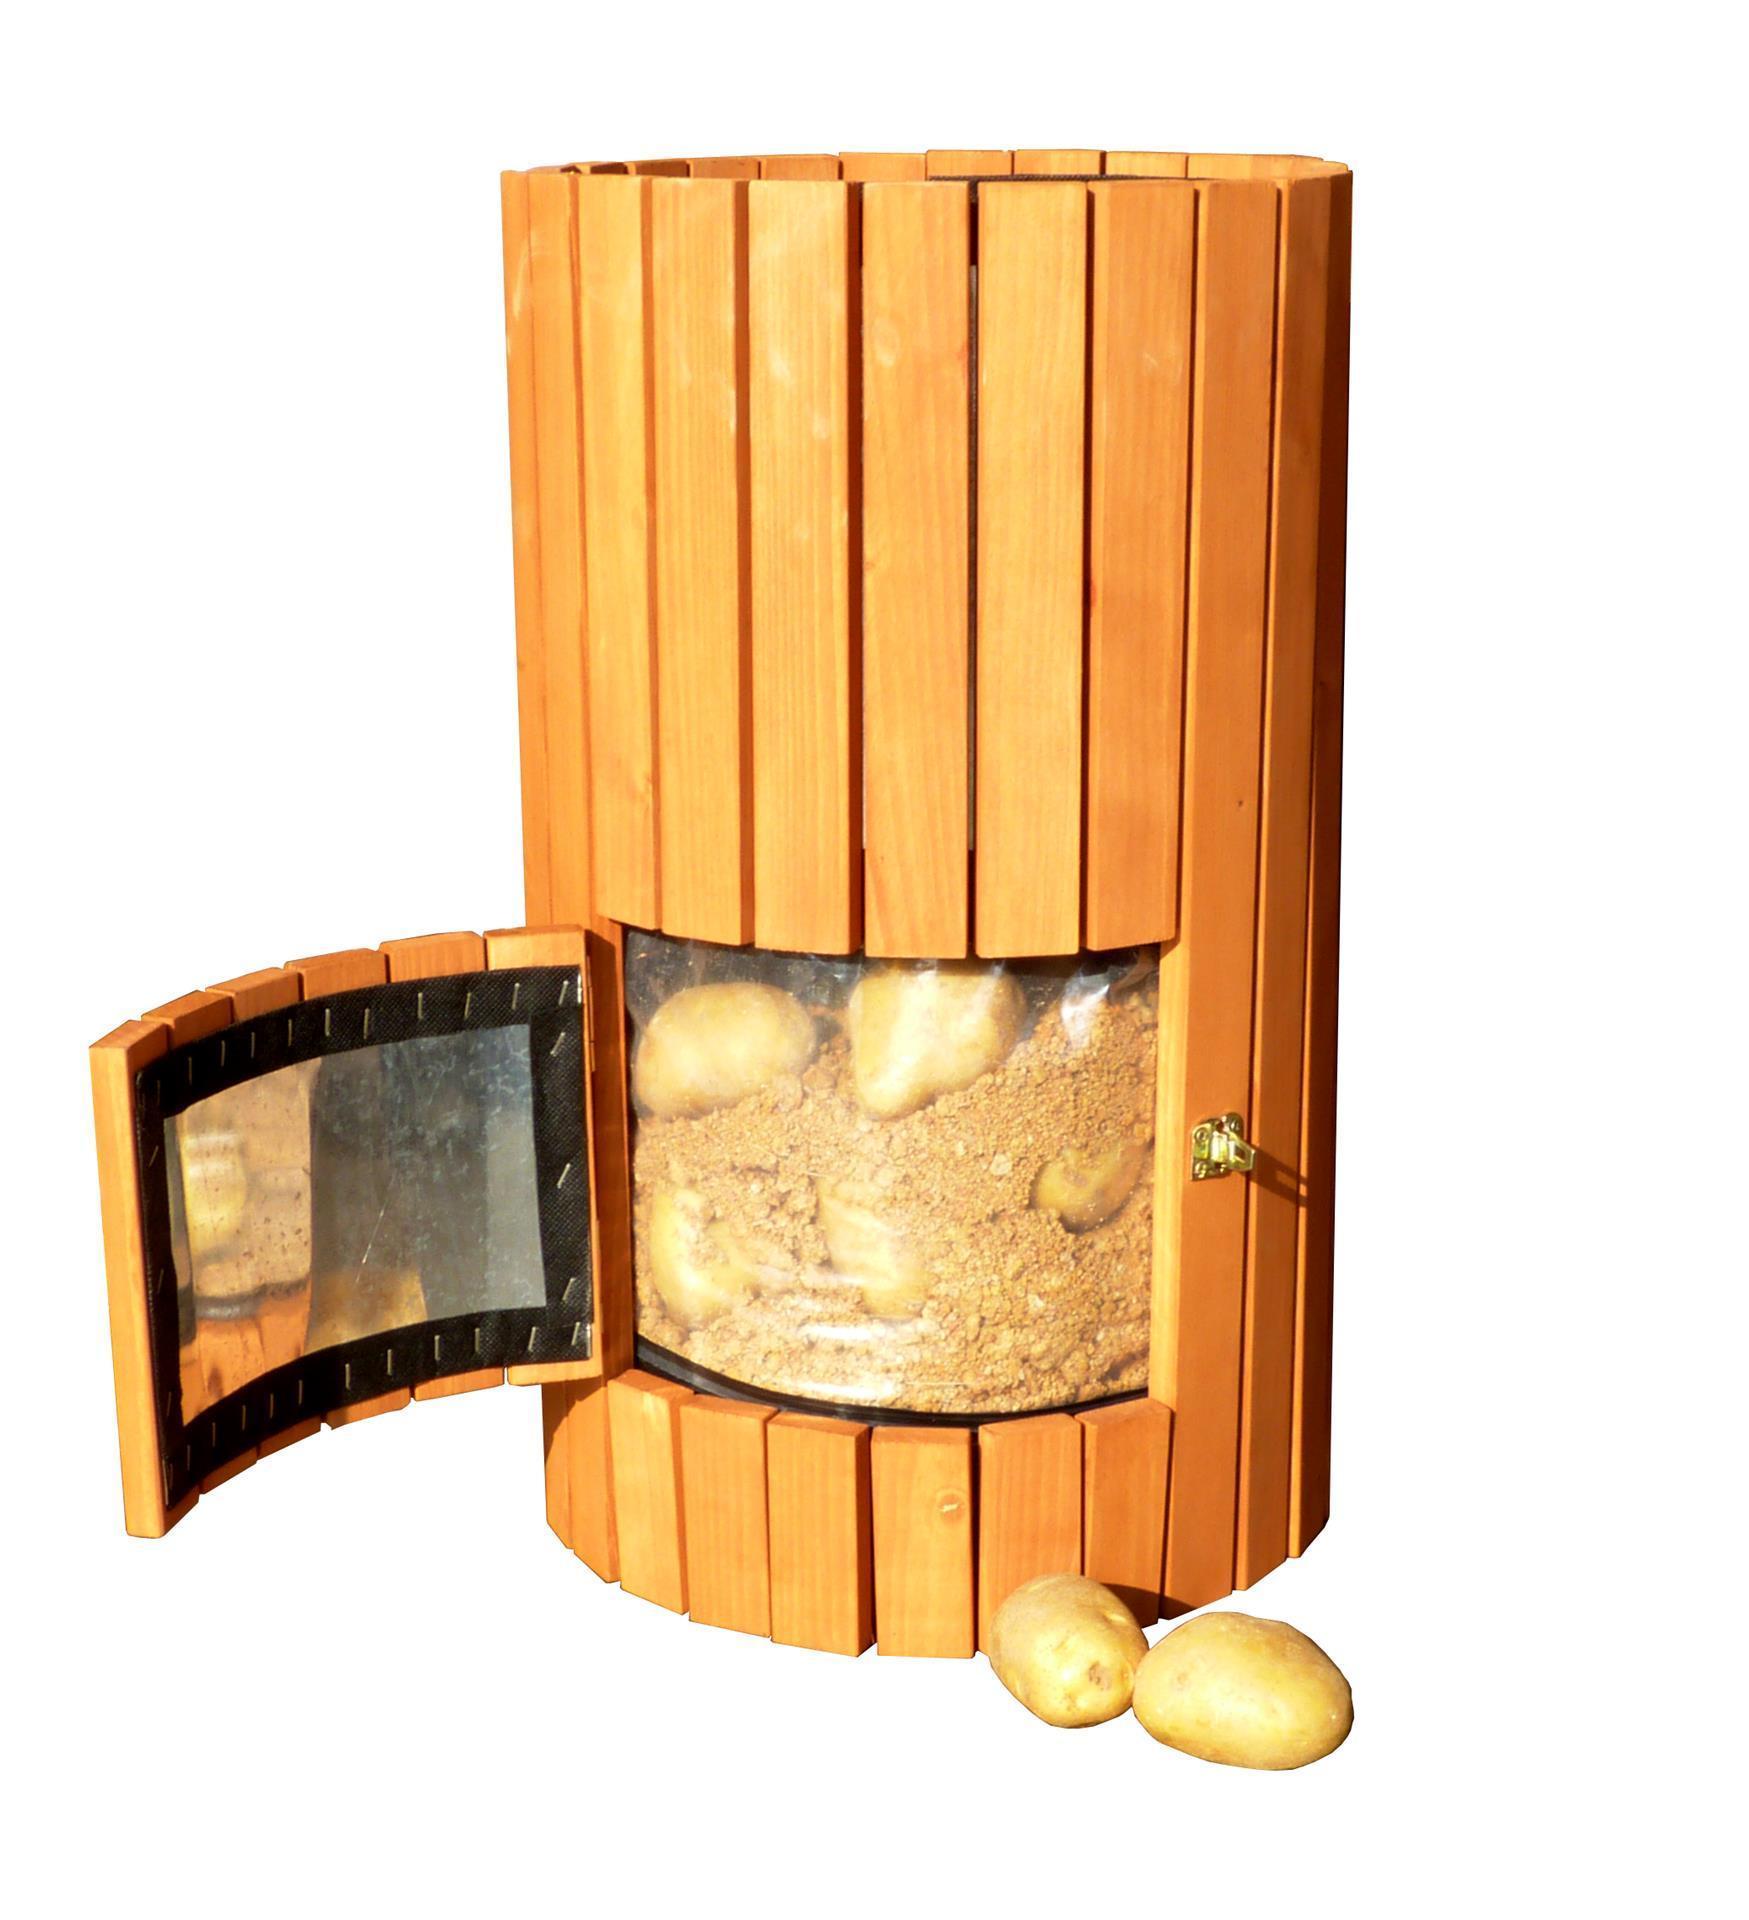 Potato Barrel - Wooden Potato Planter